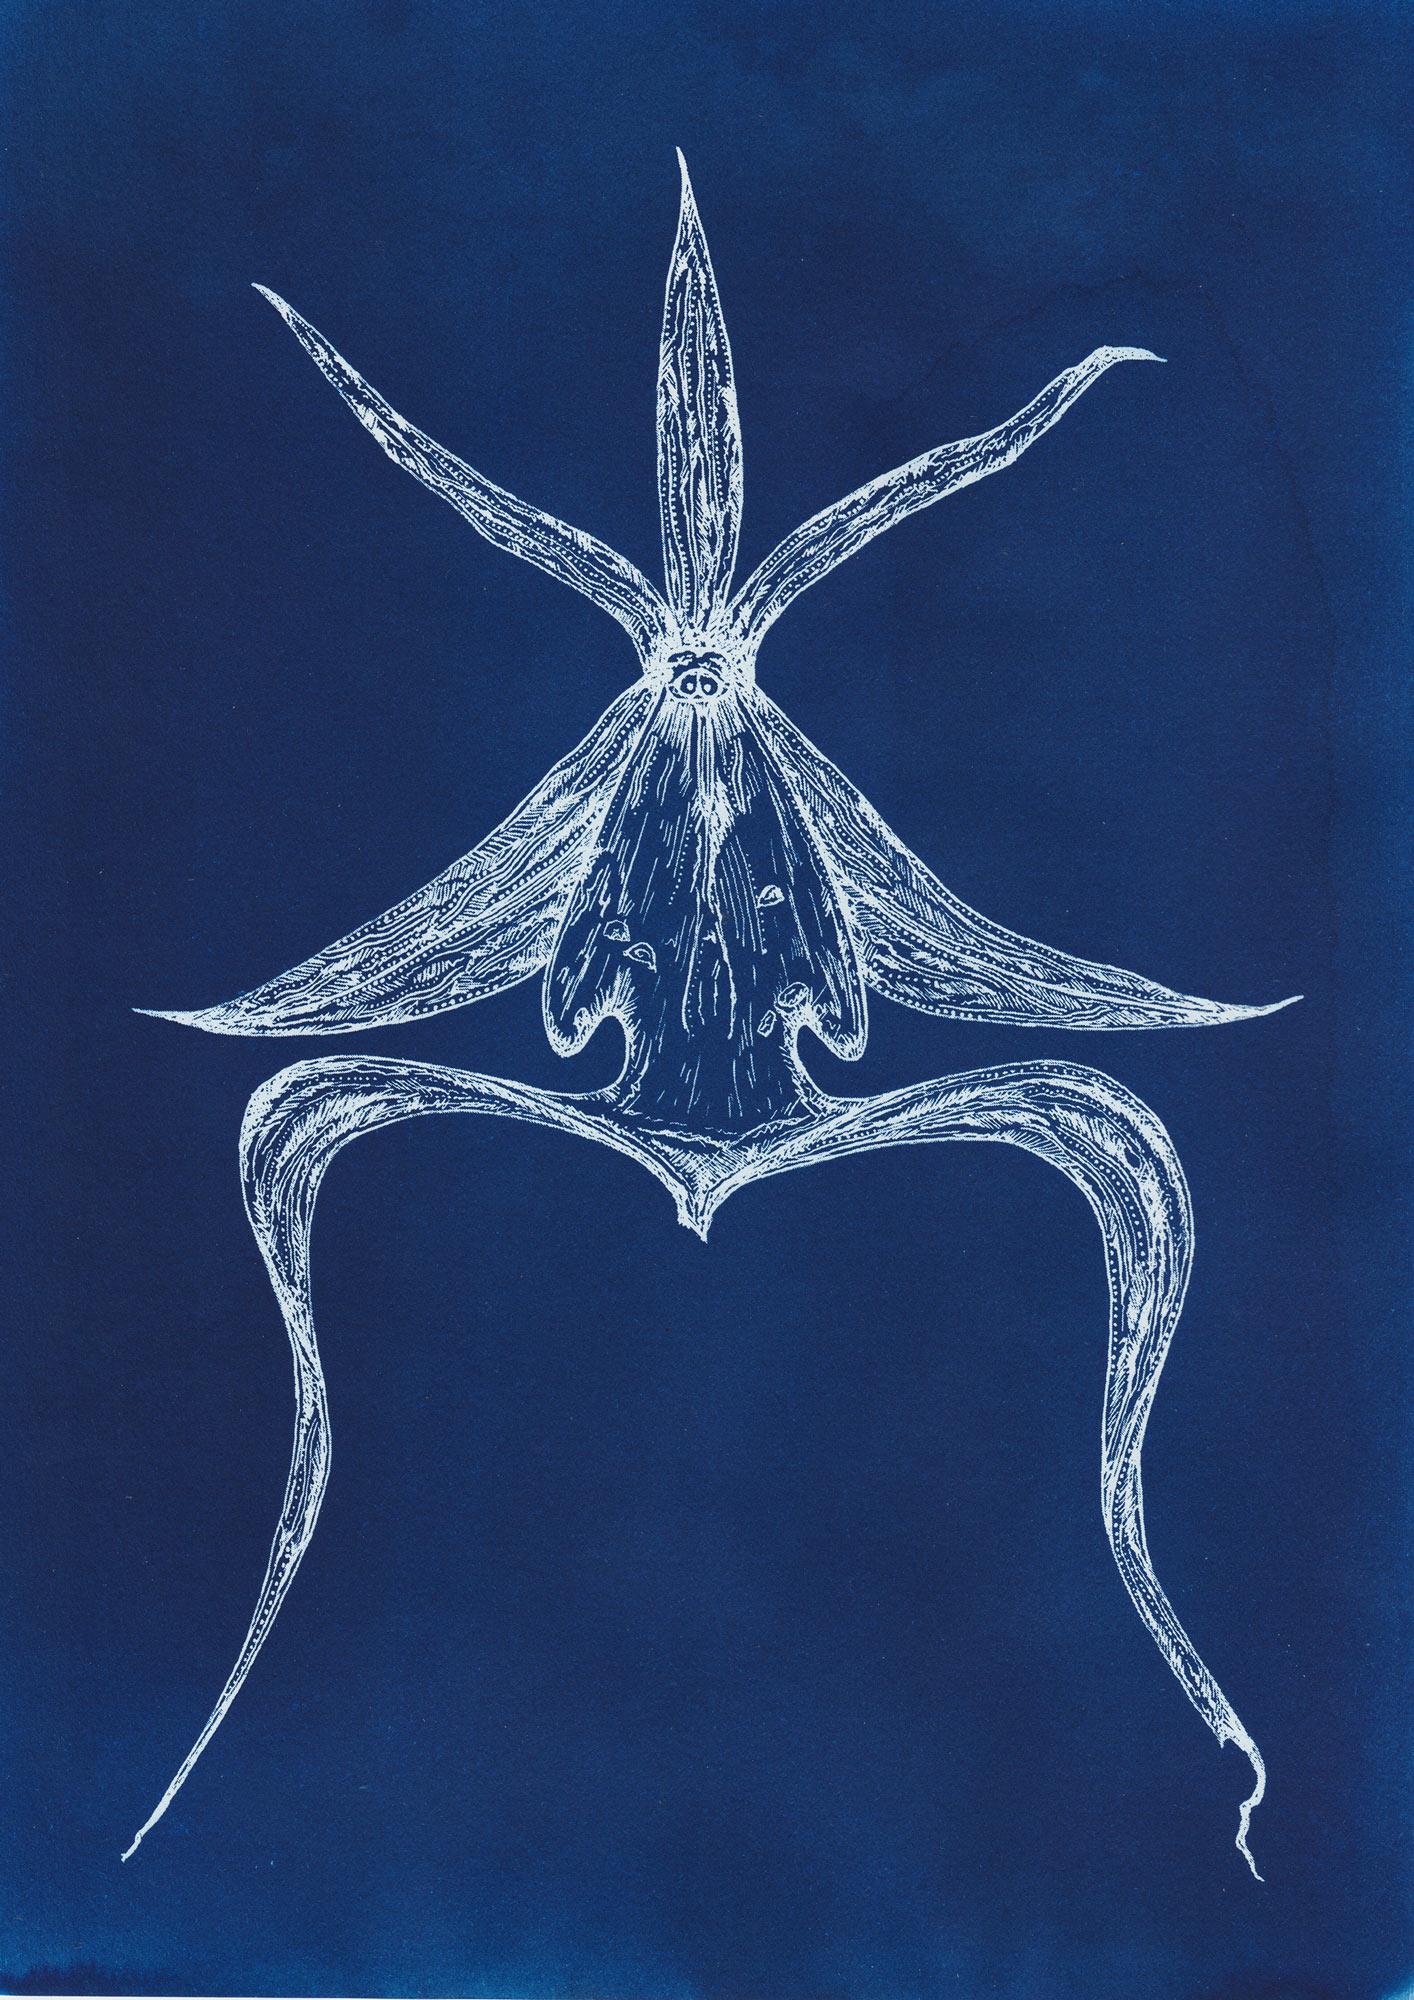 Amy Pezzin Garden of Extinction blue cyanotype images